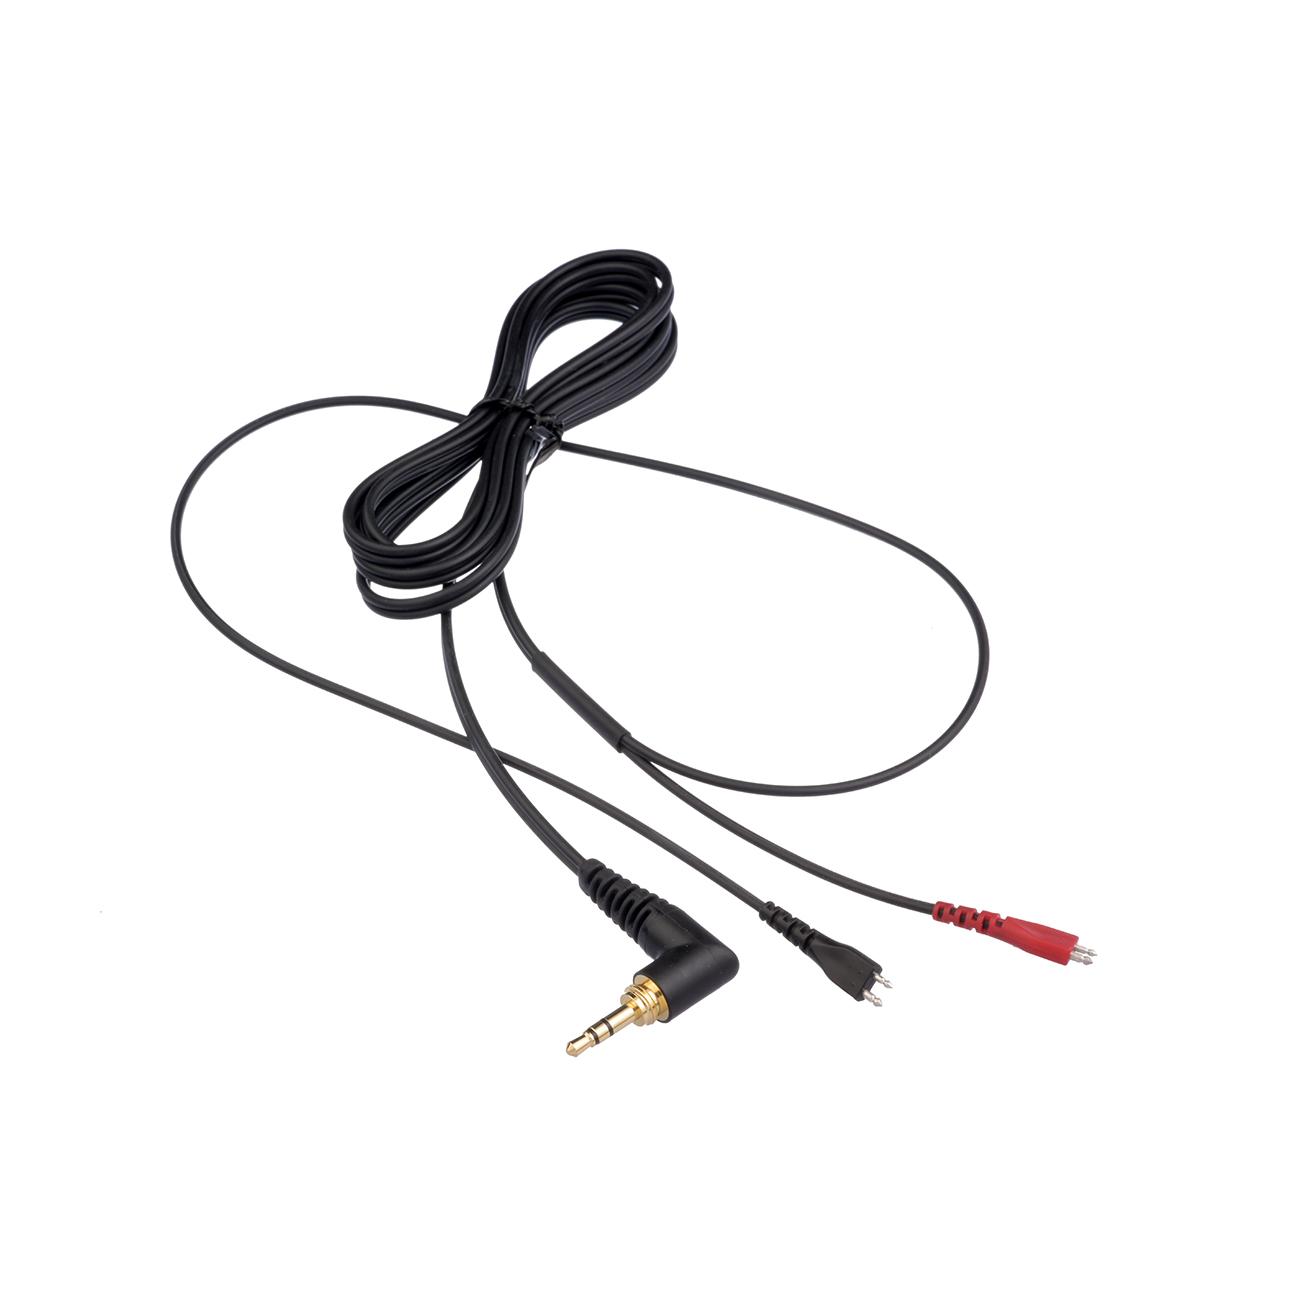 Cable with angled plug, 1,5m